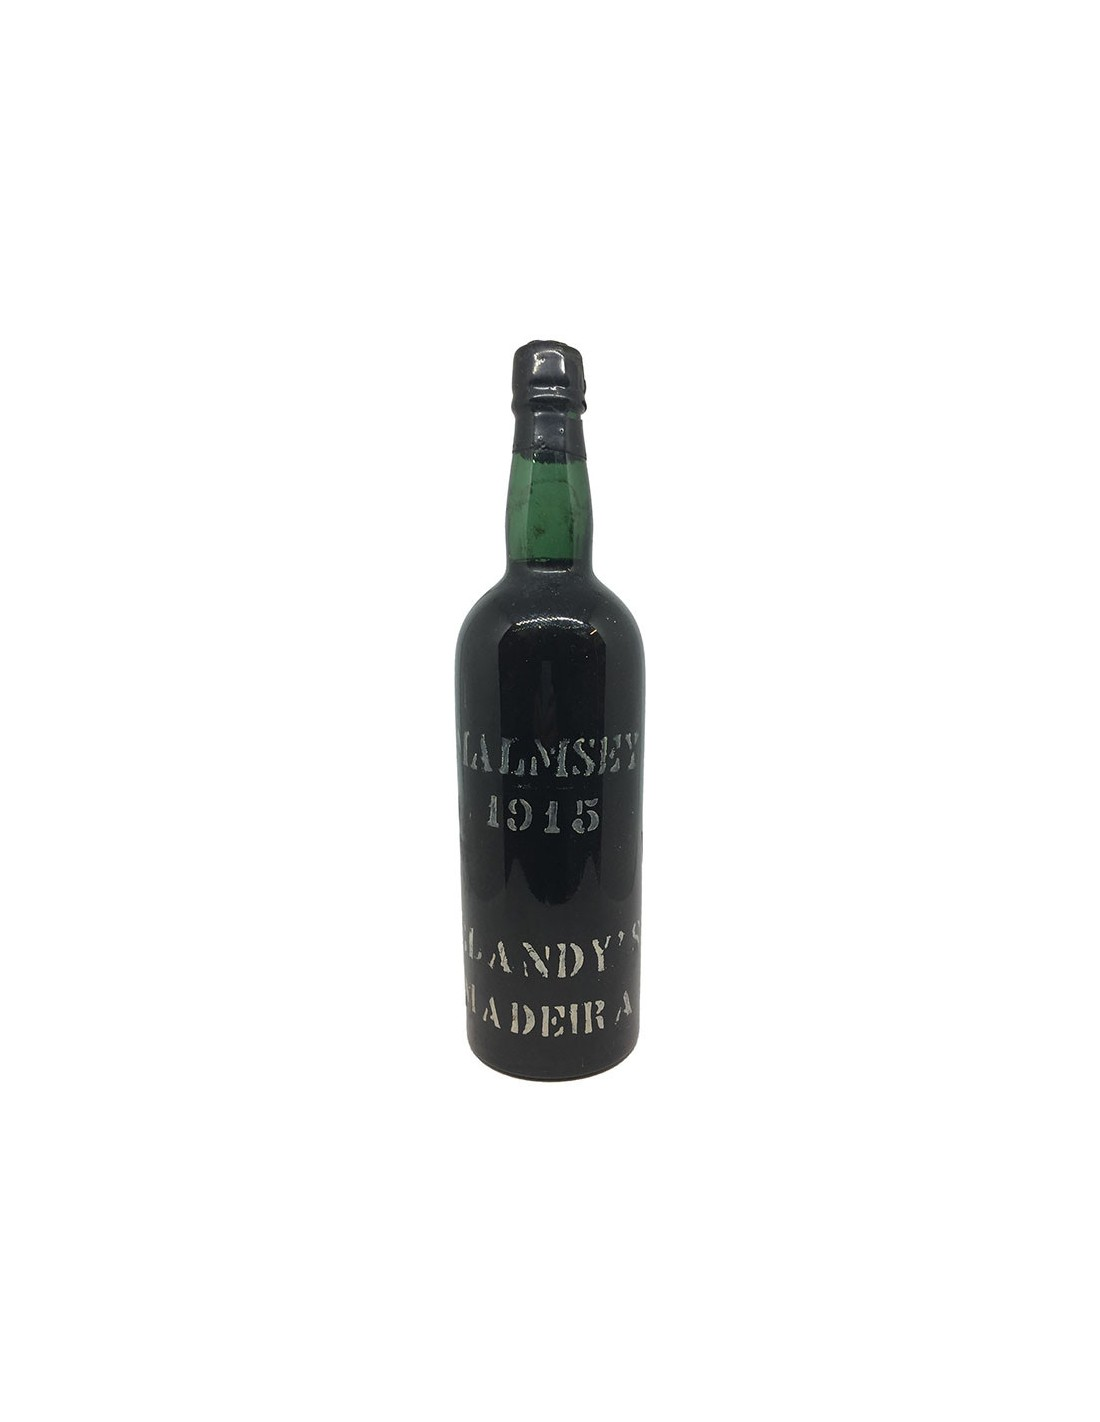 BLANDY MADEIRA 1915 MALMSEY Grandi Bottiglie